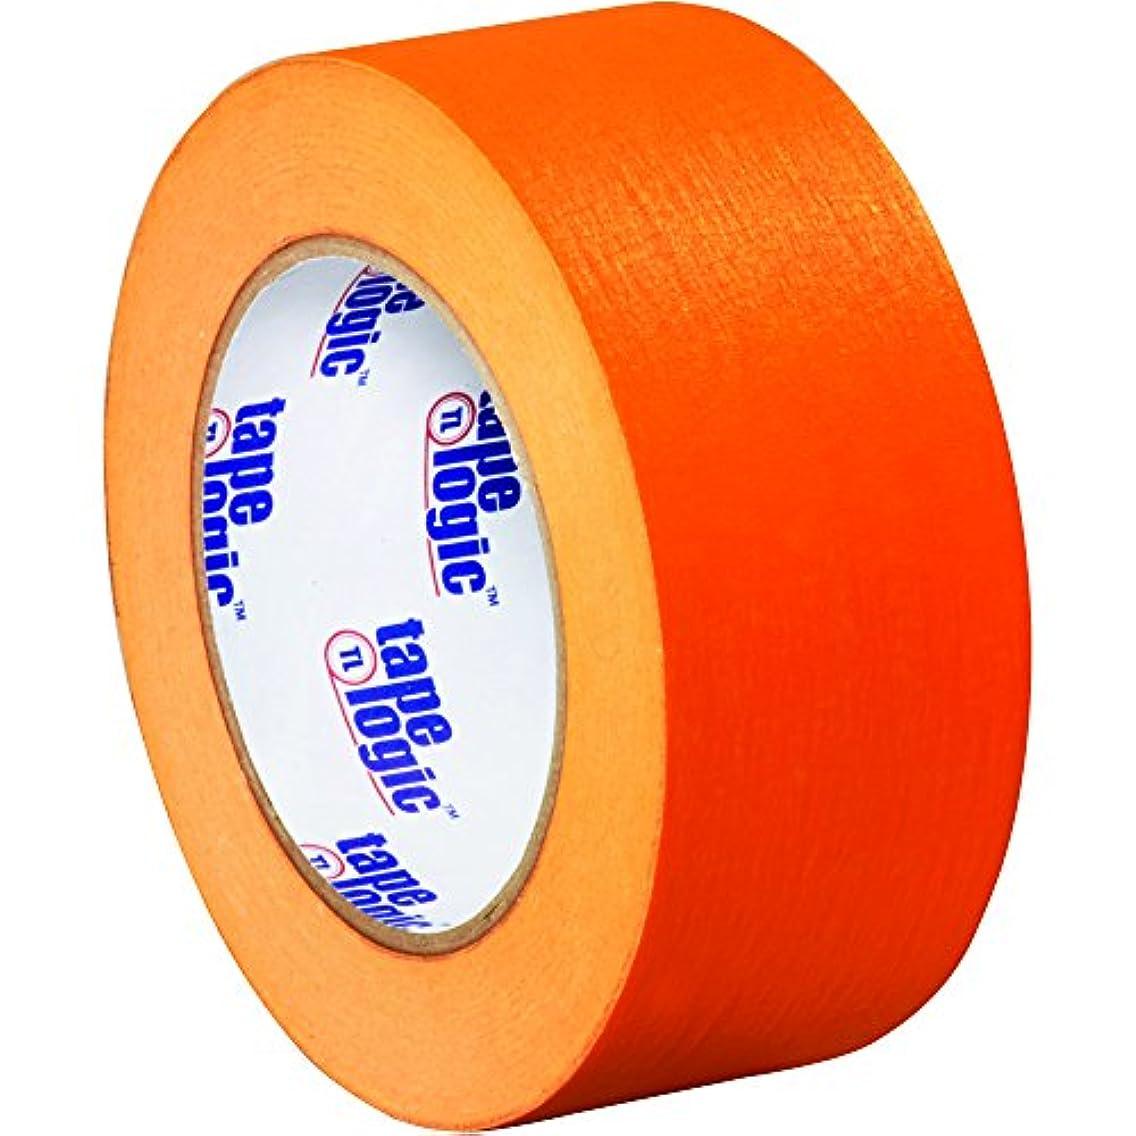 Partners Brand PT937003D Tape Logic Masking Tape, 2